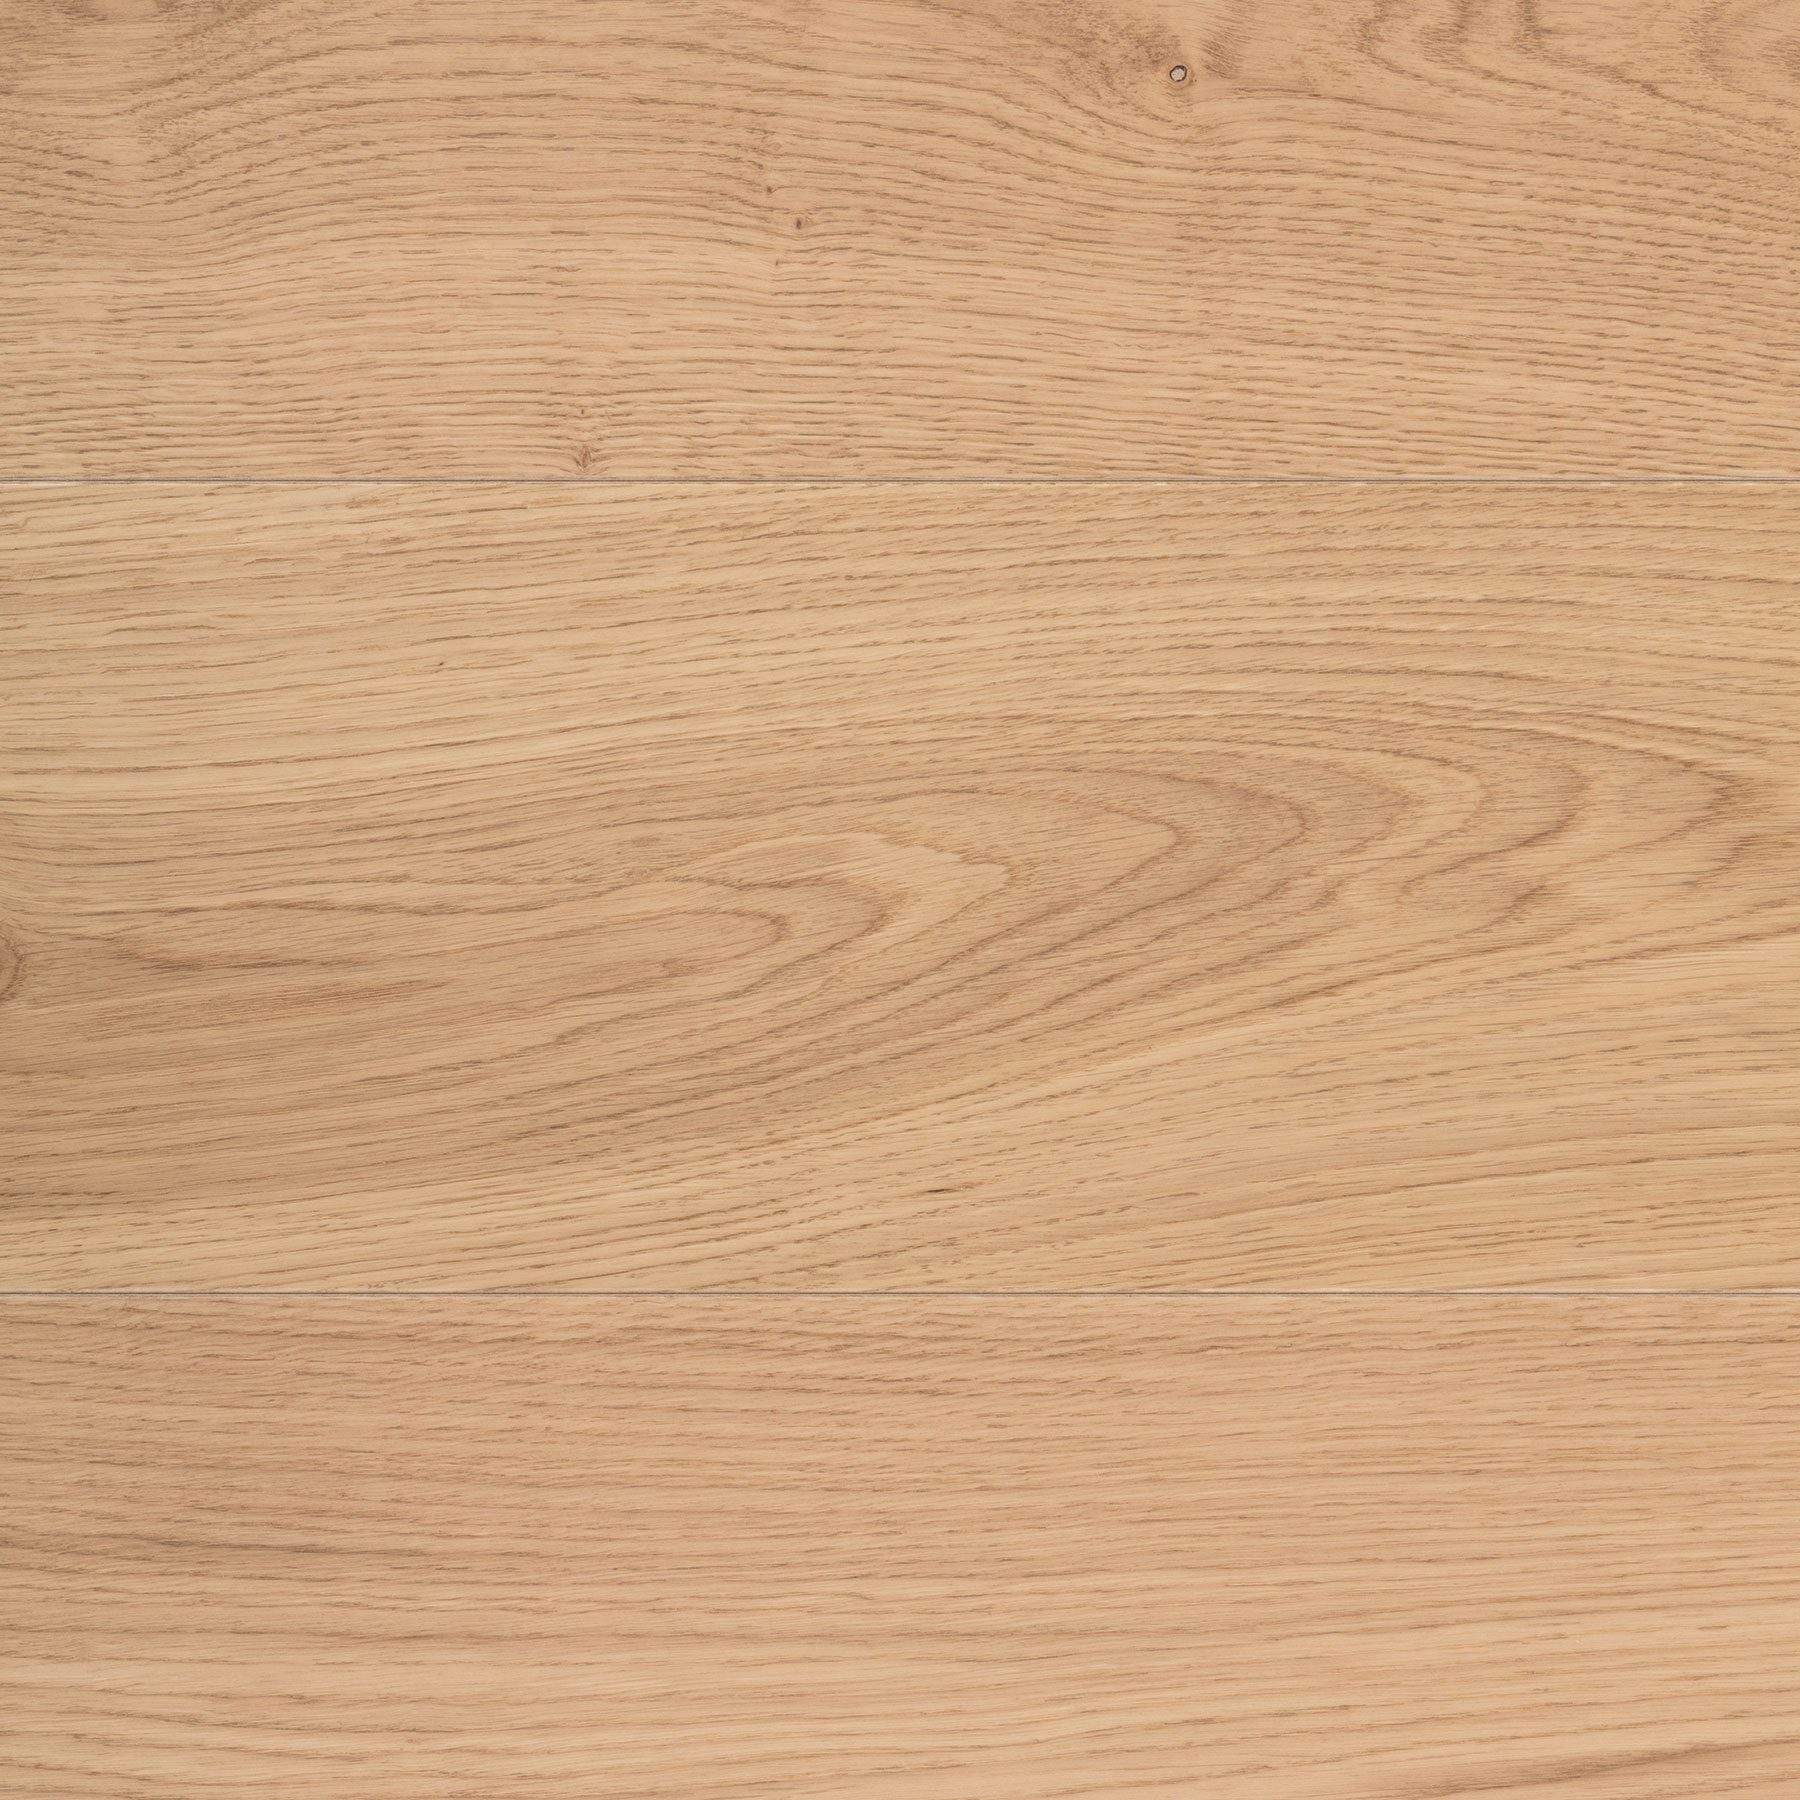 Superieur Greenwood Flooring International